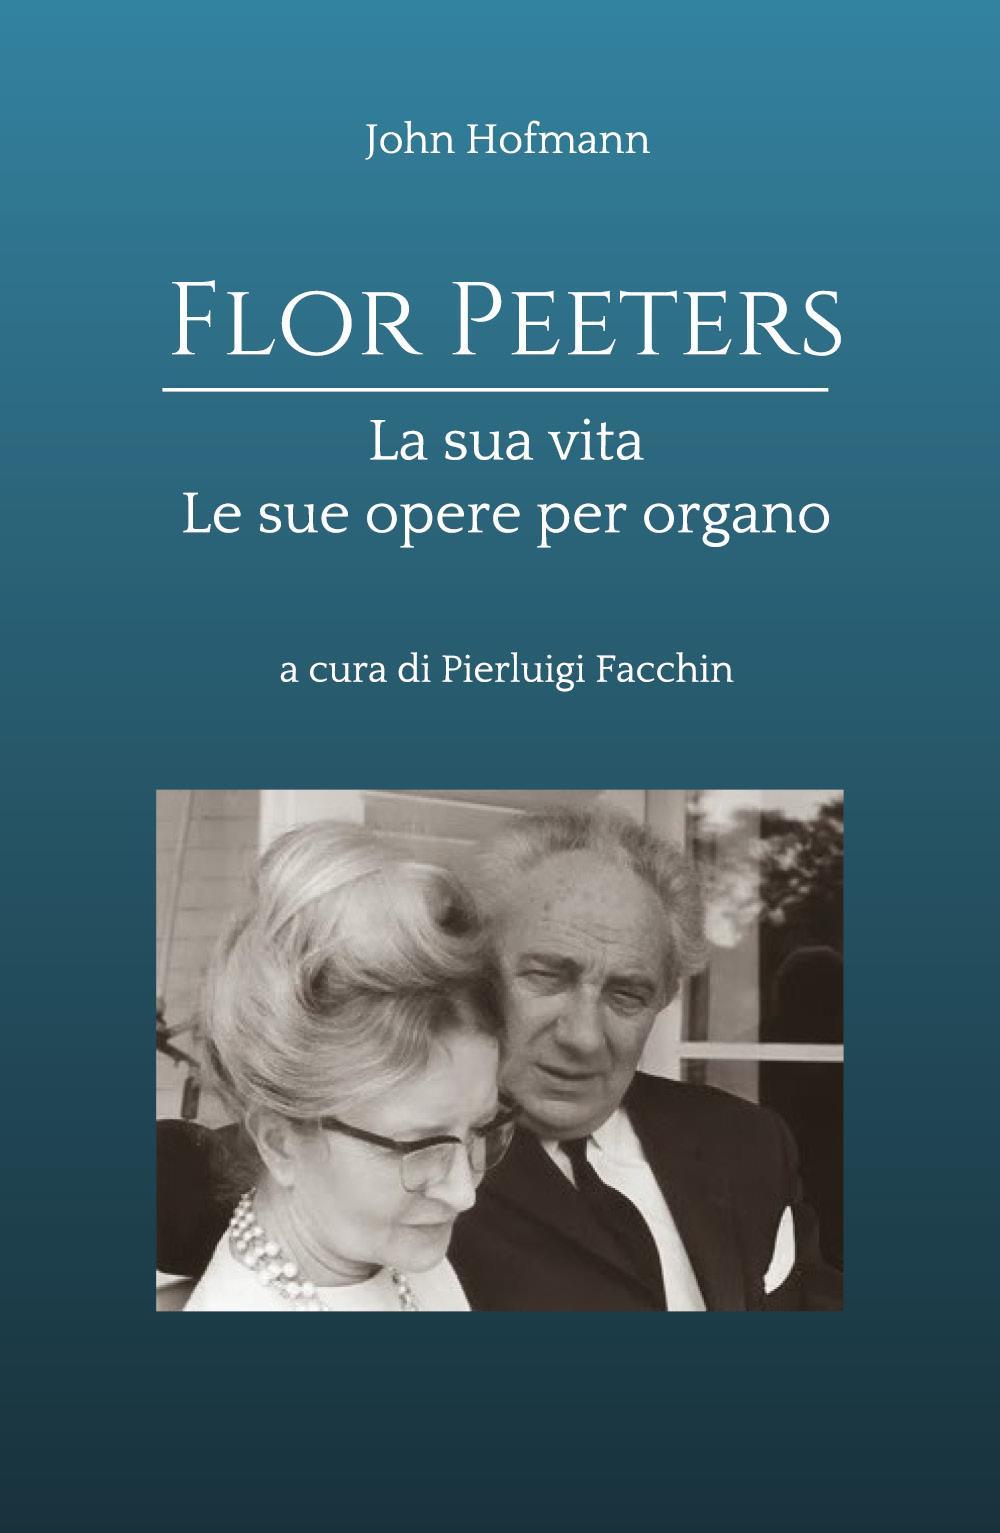 John Hofmann - FLOR PEETERS LA SUA VITA LE SUE OPERE PER ORGANO